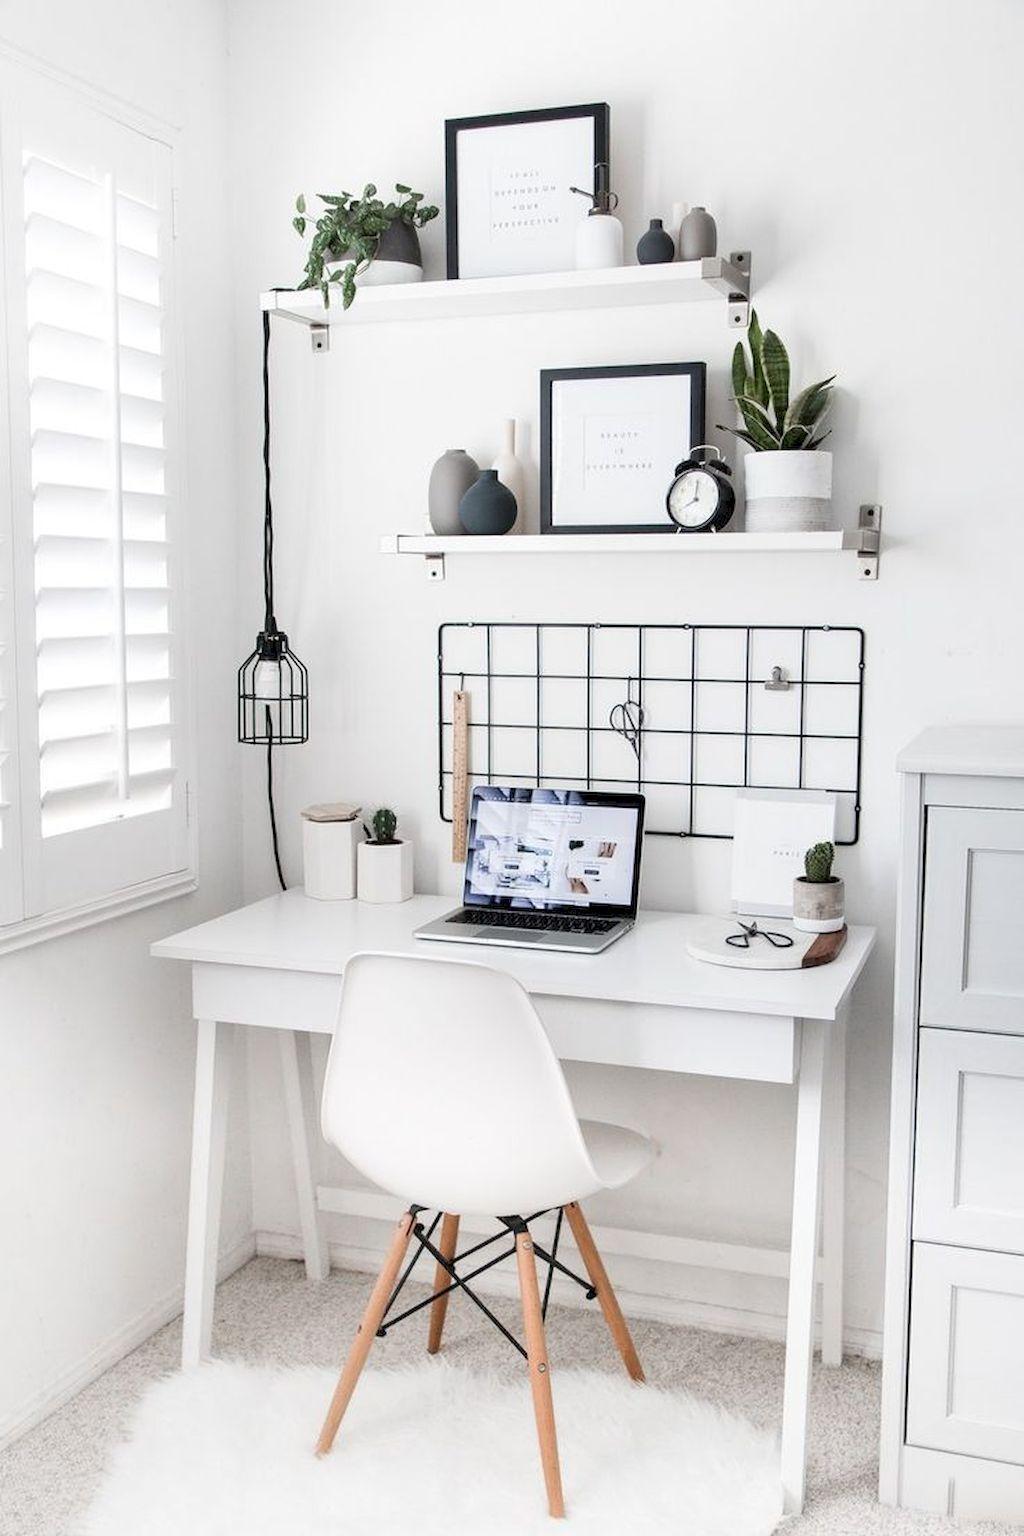 Cool 55 Cozy Small Living Room Apartment Design Ideas Https://decoralink.com